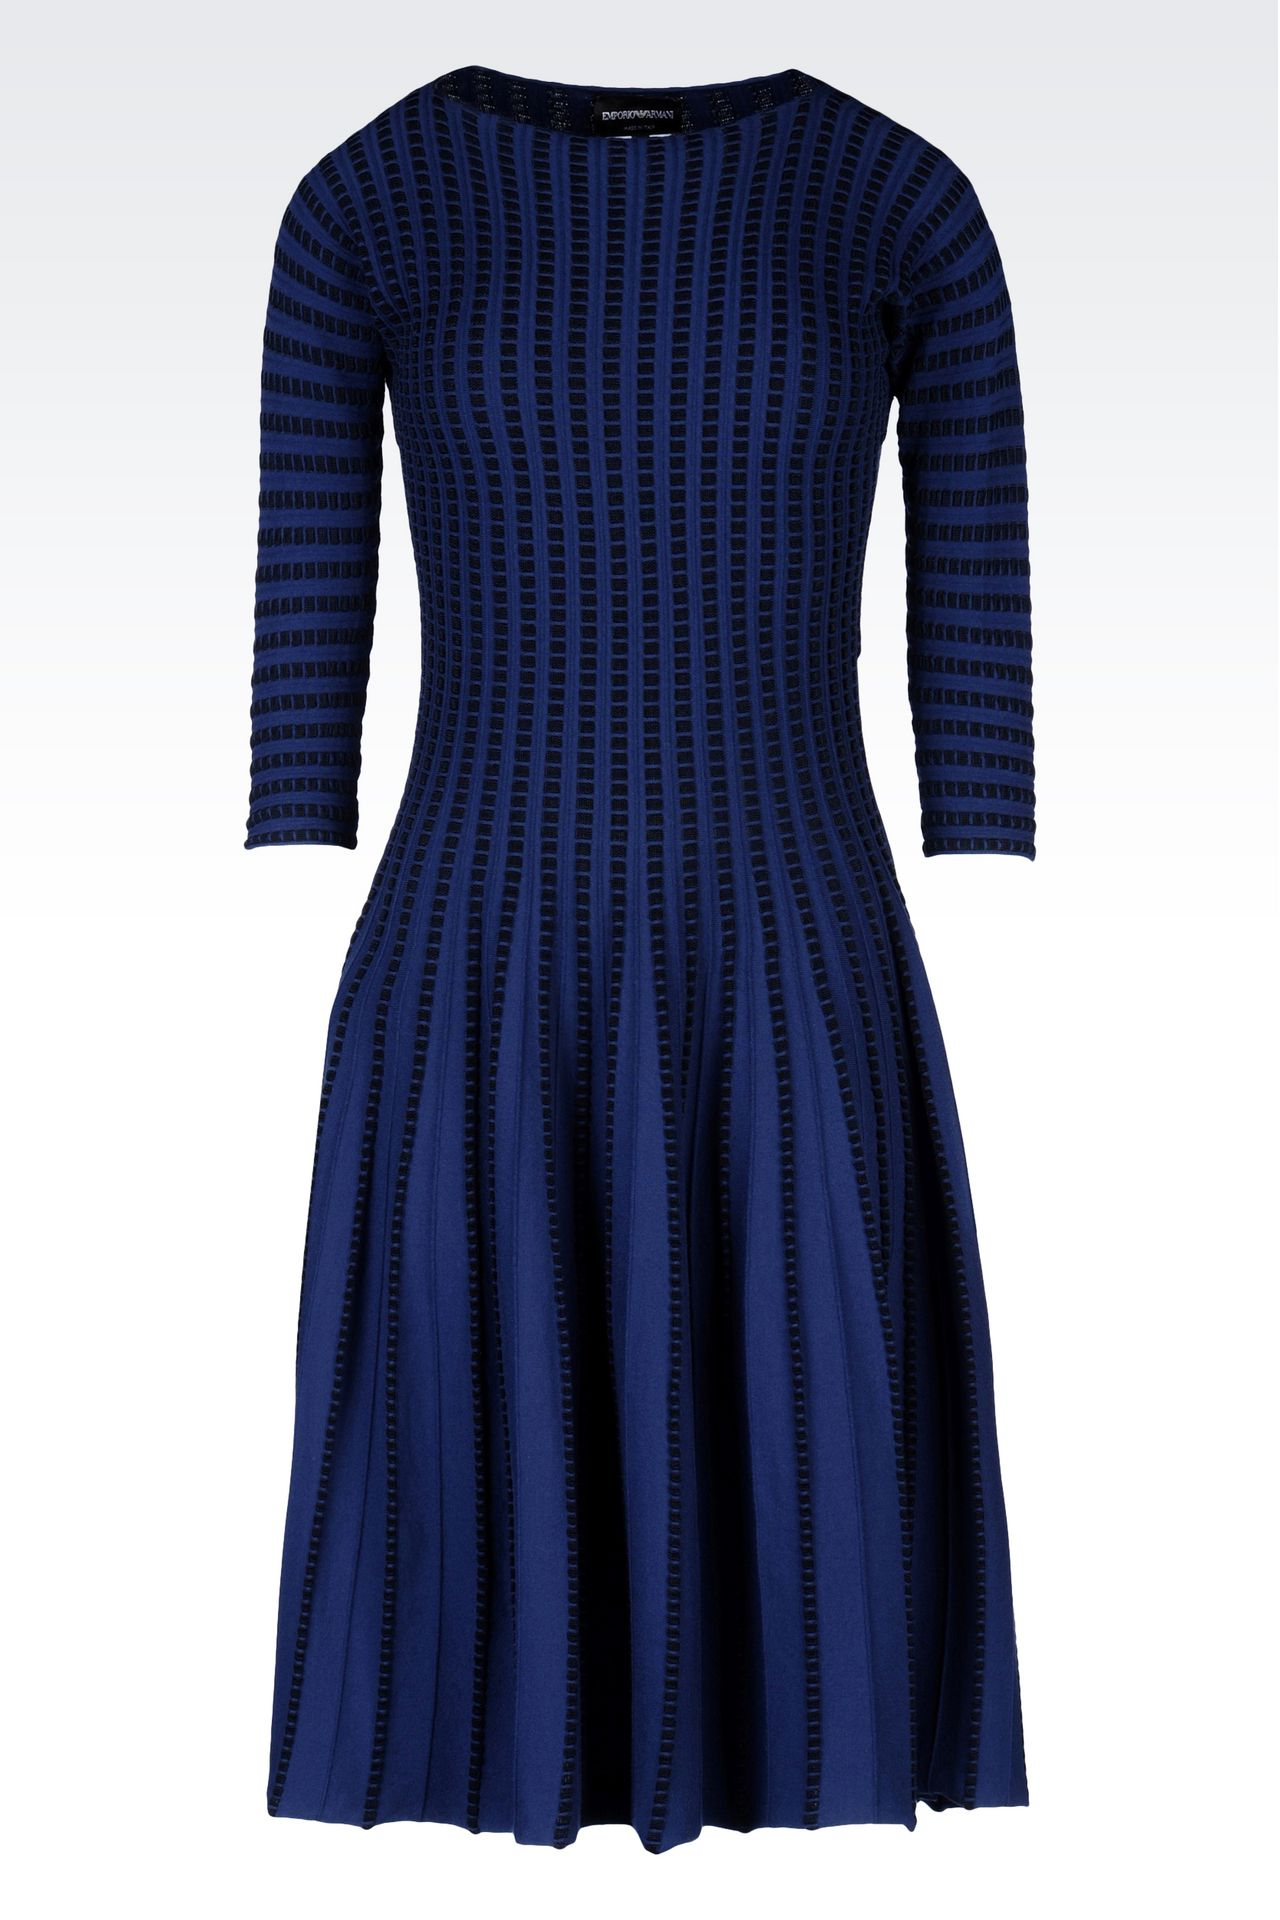 PLISSÉ DRESS IN VISCOSE BLEND: Short Dresses Women by Armani - 0